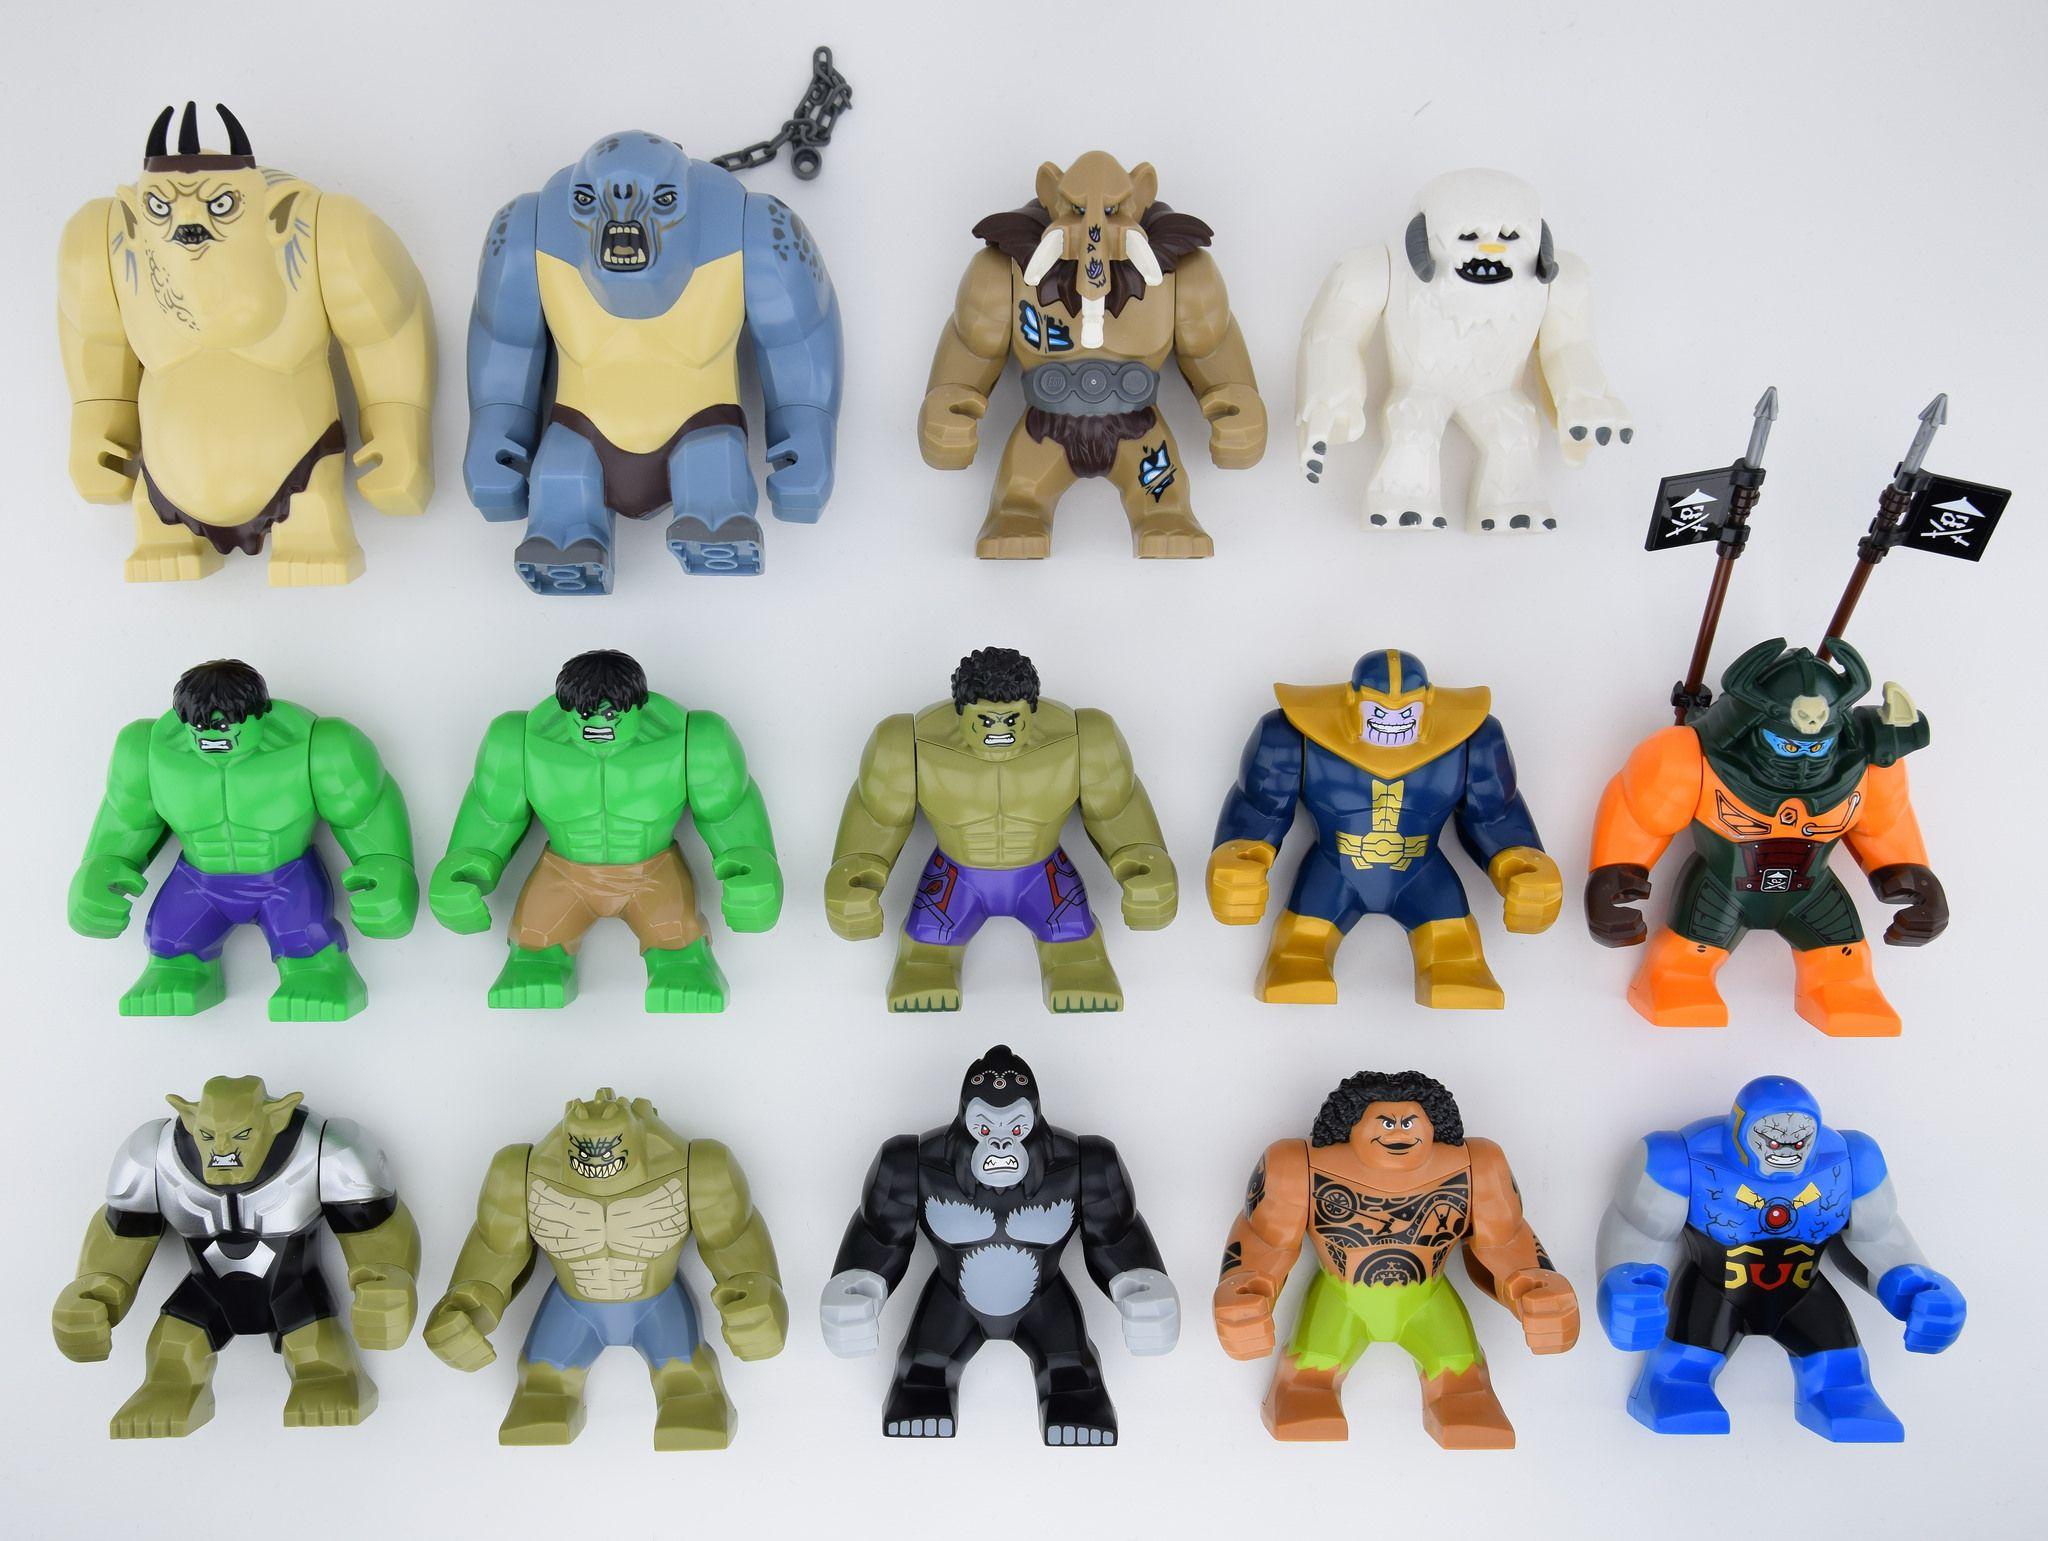 DC Comics Batman Lego Moc Minifigures Toys Large Killer Croc